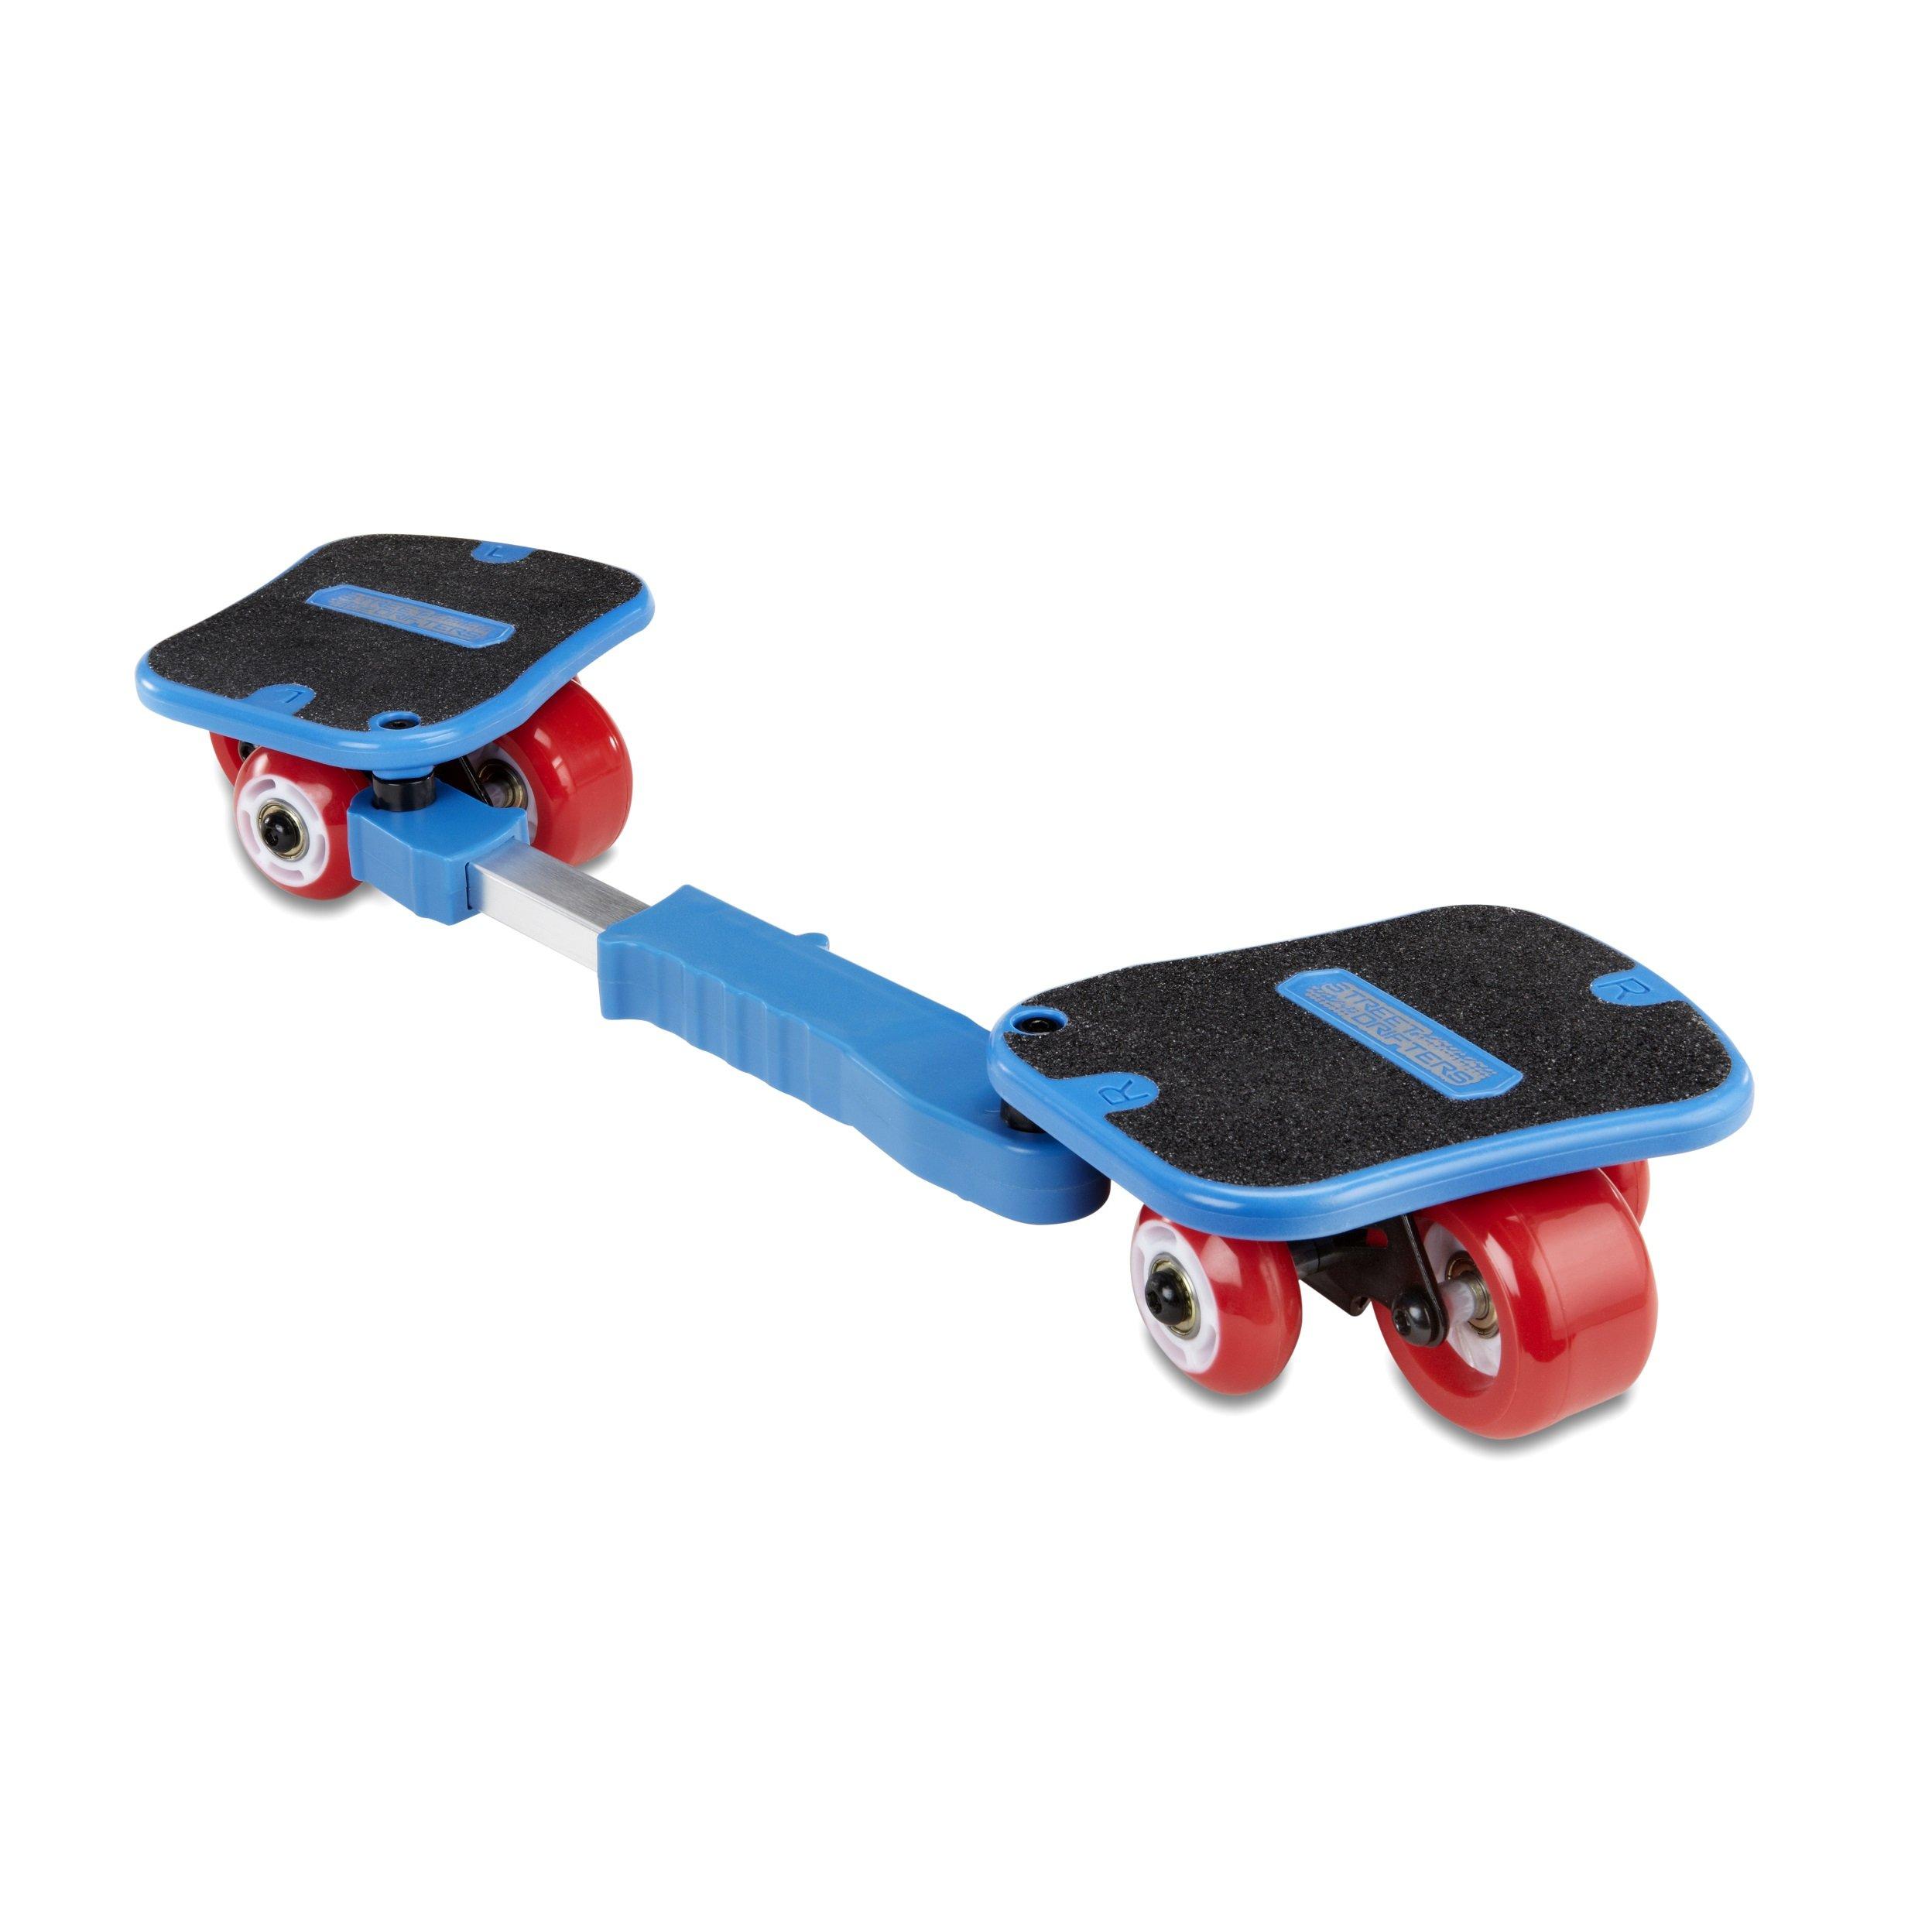 VIRO Rides Street Drifters - Freestyle Sideways Skates by Viro Rides